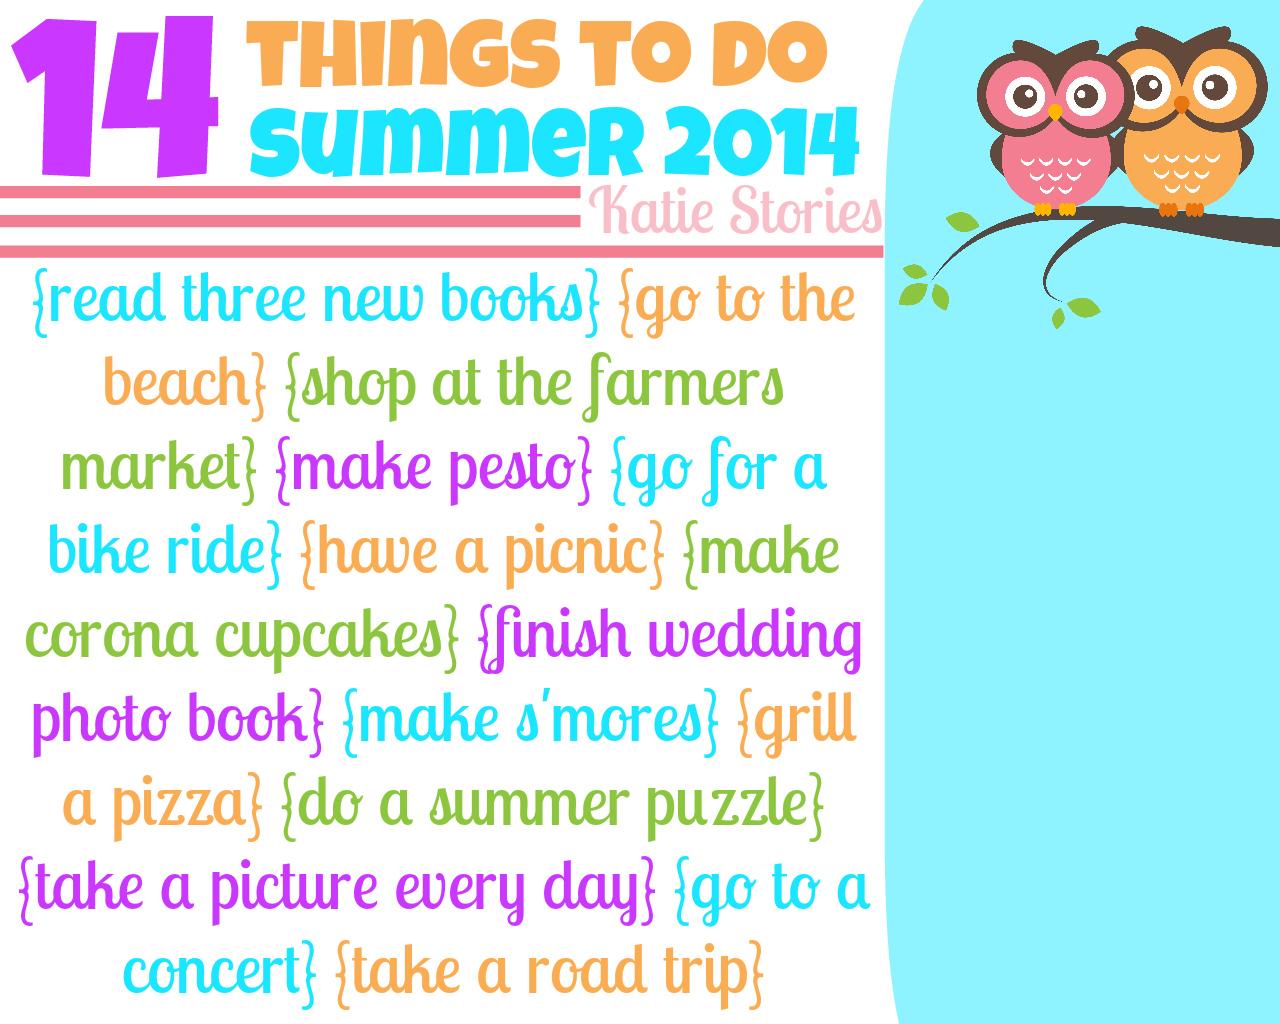 Katie Stories {Scrapbook + Crafting Blog}: Summer List {2014}